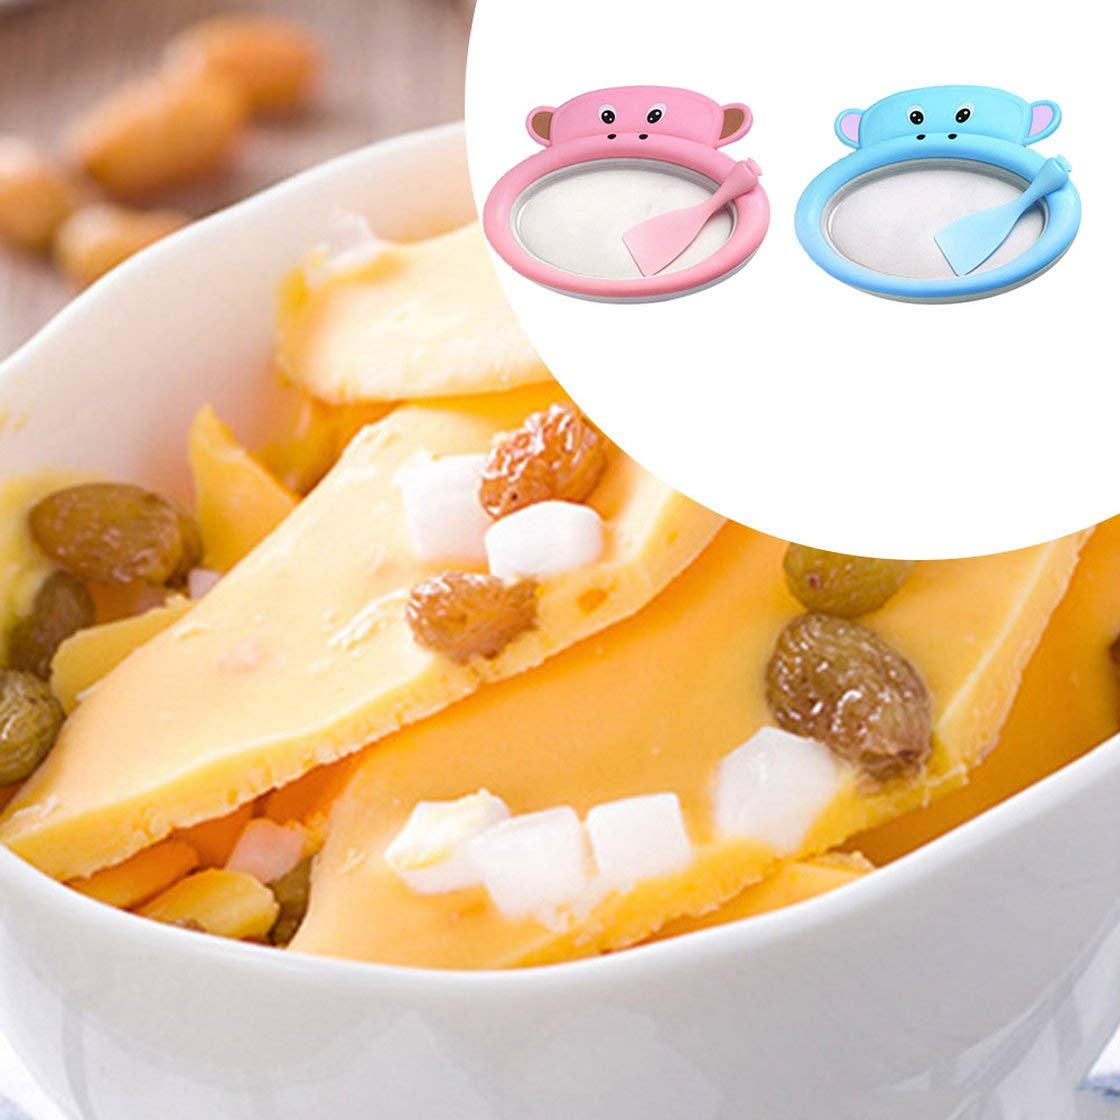 Instant Fried Ice Cube Maker Machine DIY Yogurt Pan Homemade Children Mini Fast Freeze Ice Cream Roll Making Tool